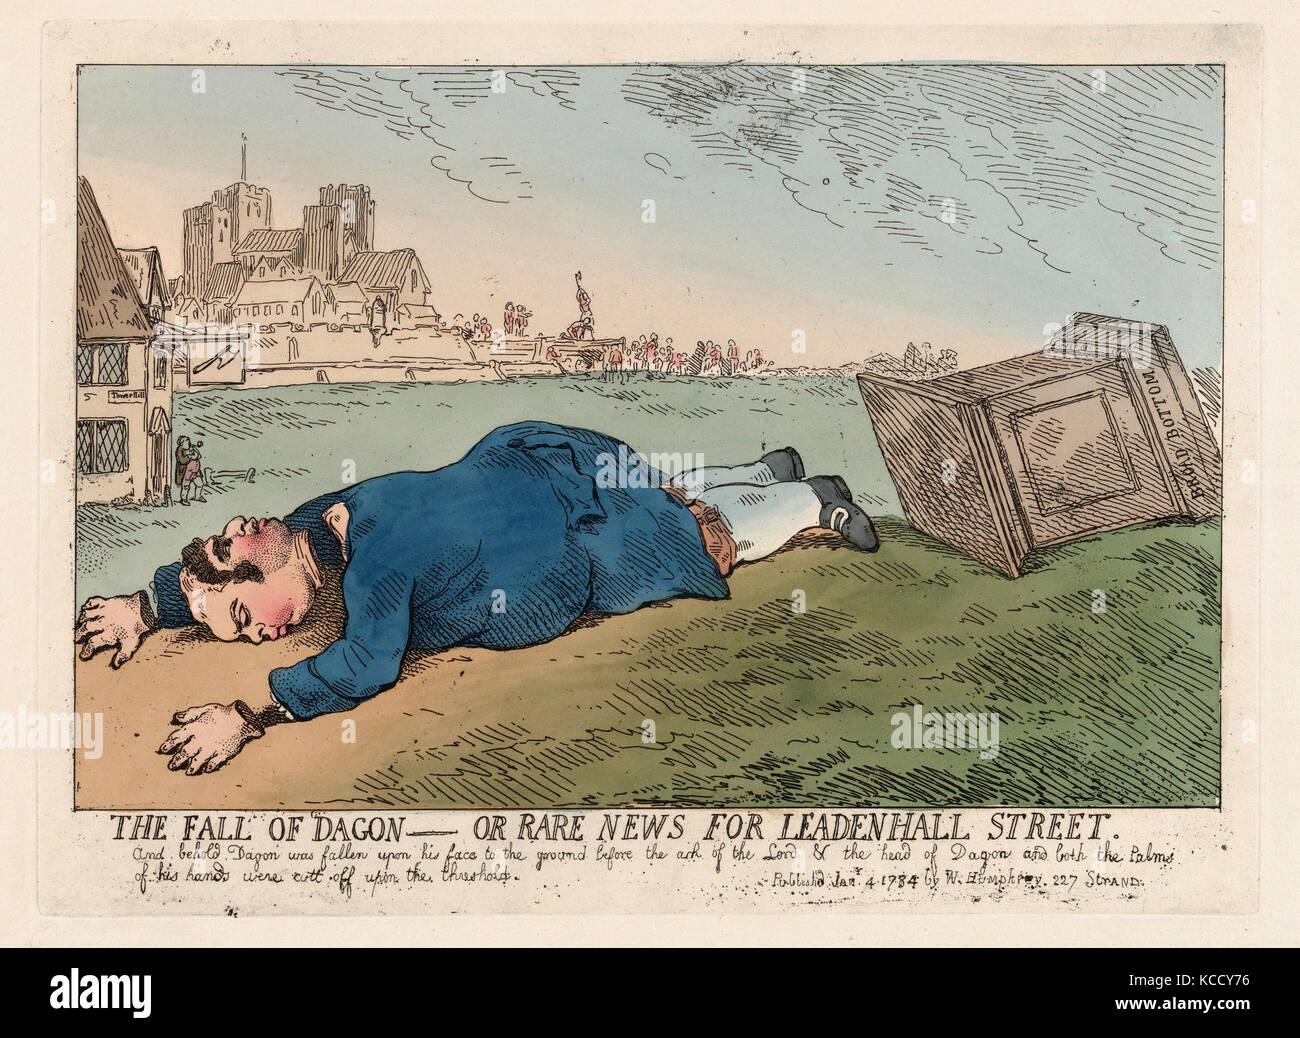 The Fall of Dagon, rare news for leadenhall street. Historical British caricature - Stock Image